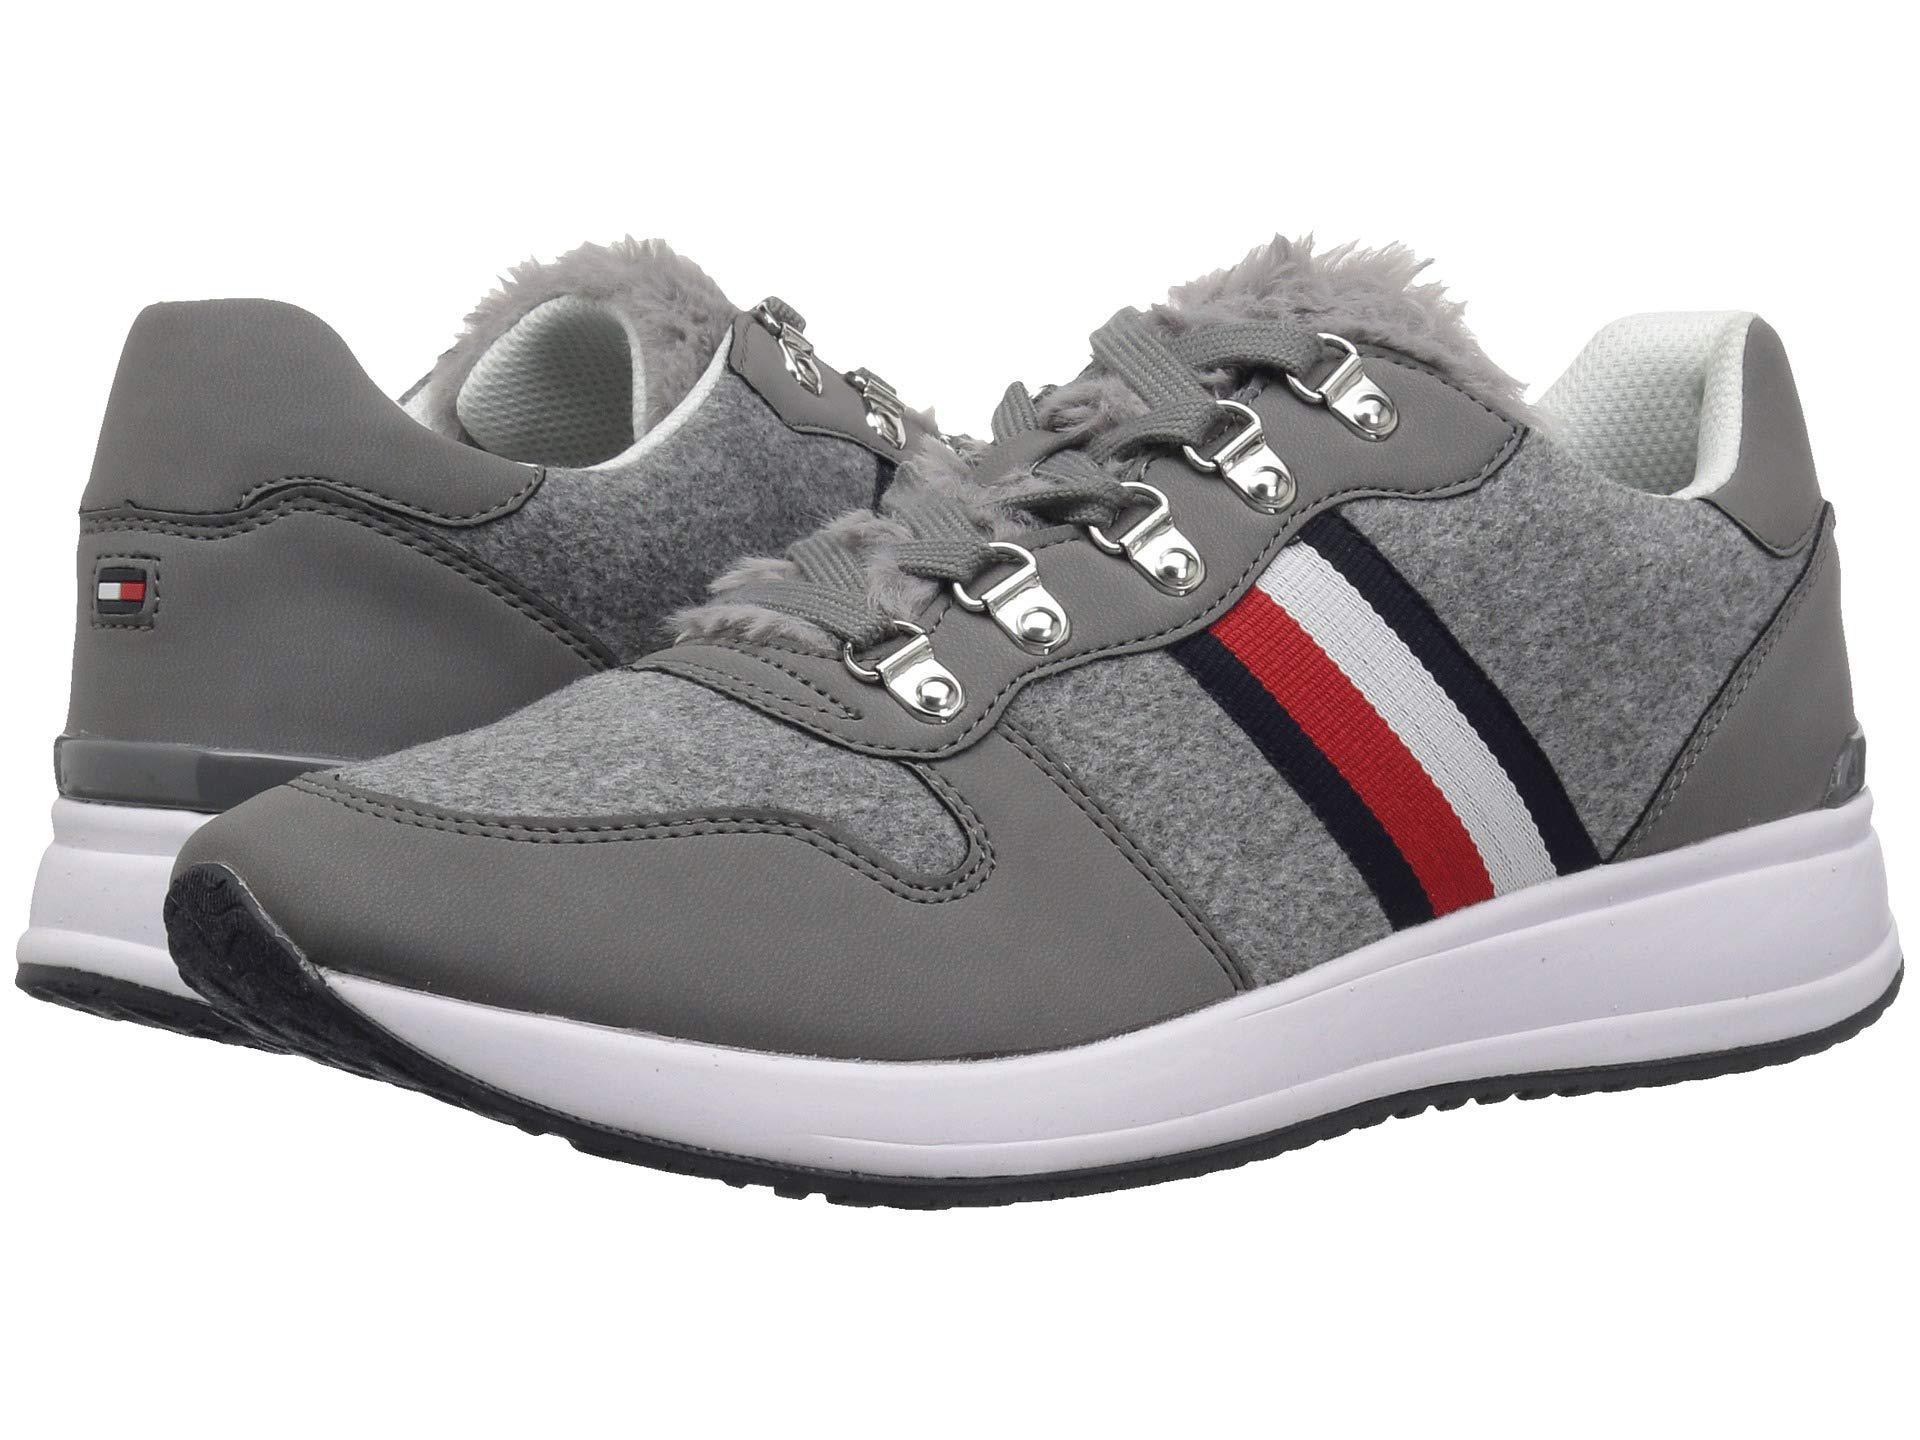 2aefec4b5149 Lyst - Tommy Hilfiger Riplee (grey) Women s Shoes in Gray